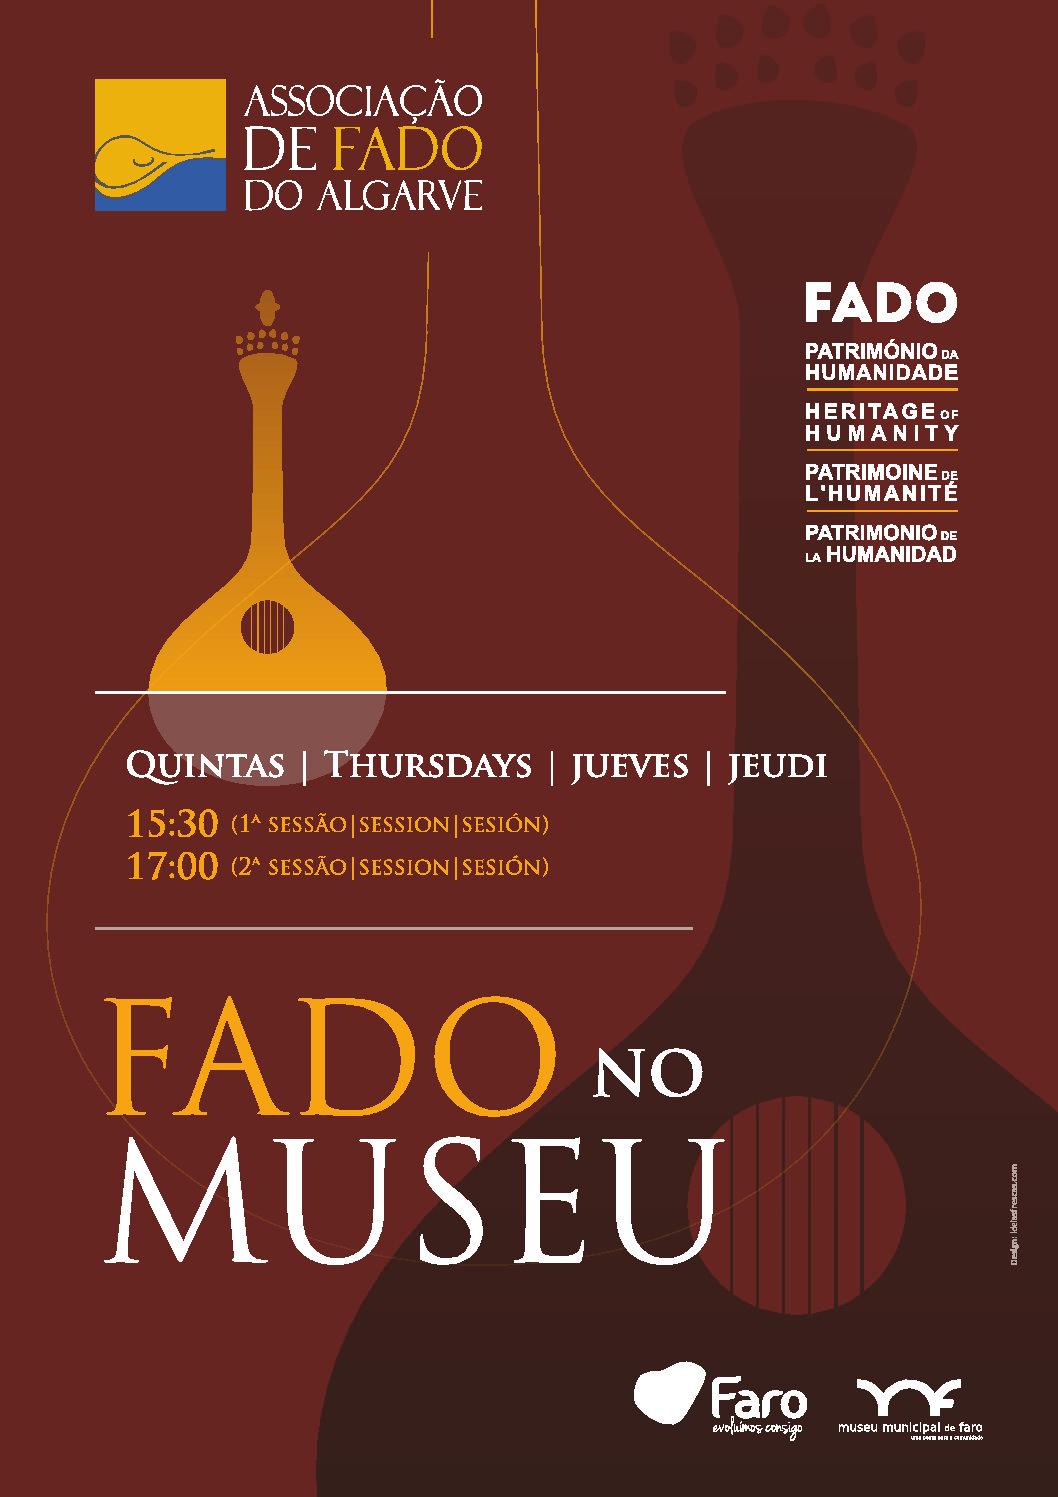 FARO: Fado no Museu (Fado au musée)